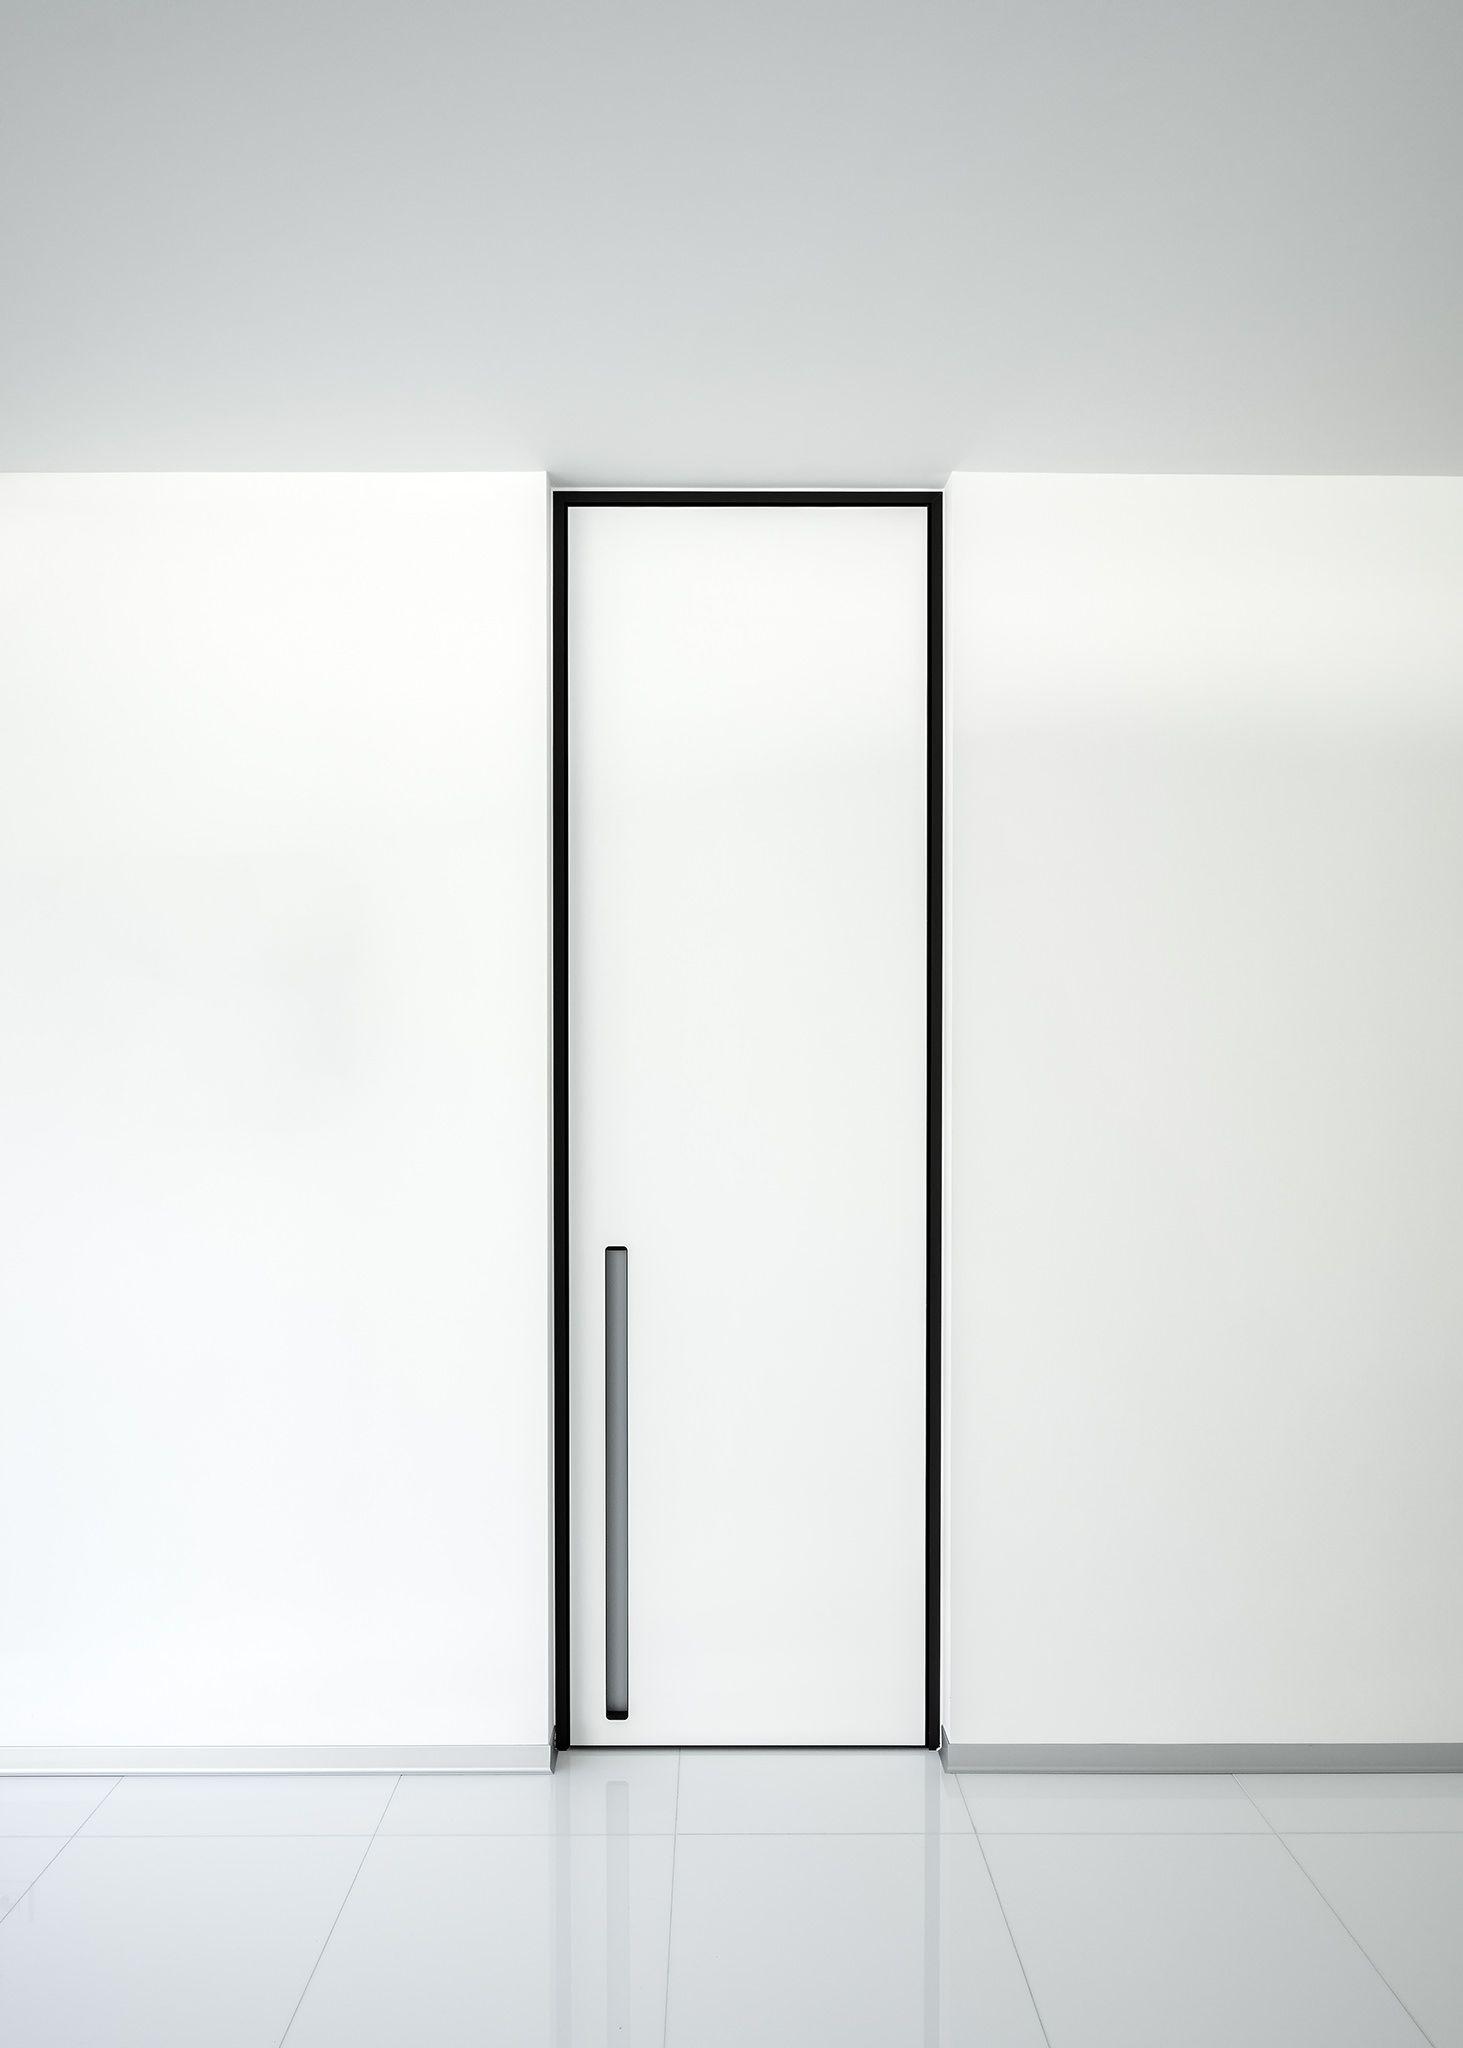 Modern White Interior Door With A Black Door Frame And Vertical Built In Handle By Anywaydoors White Interior Doors Doors Interior Glass Doors Interior